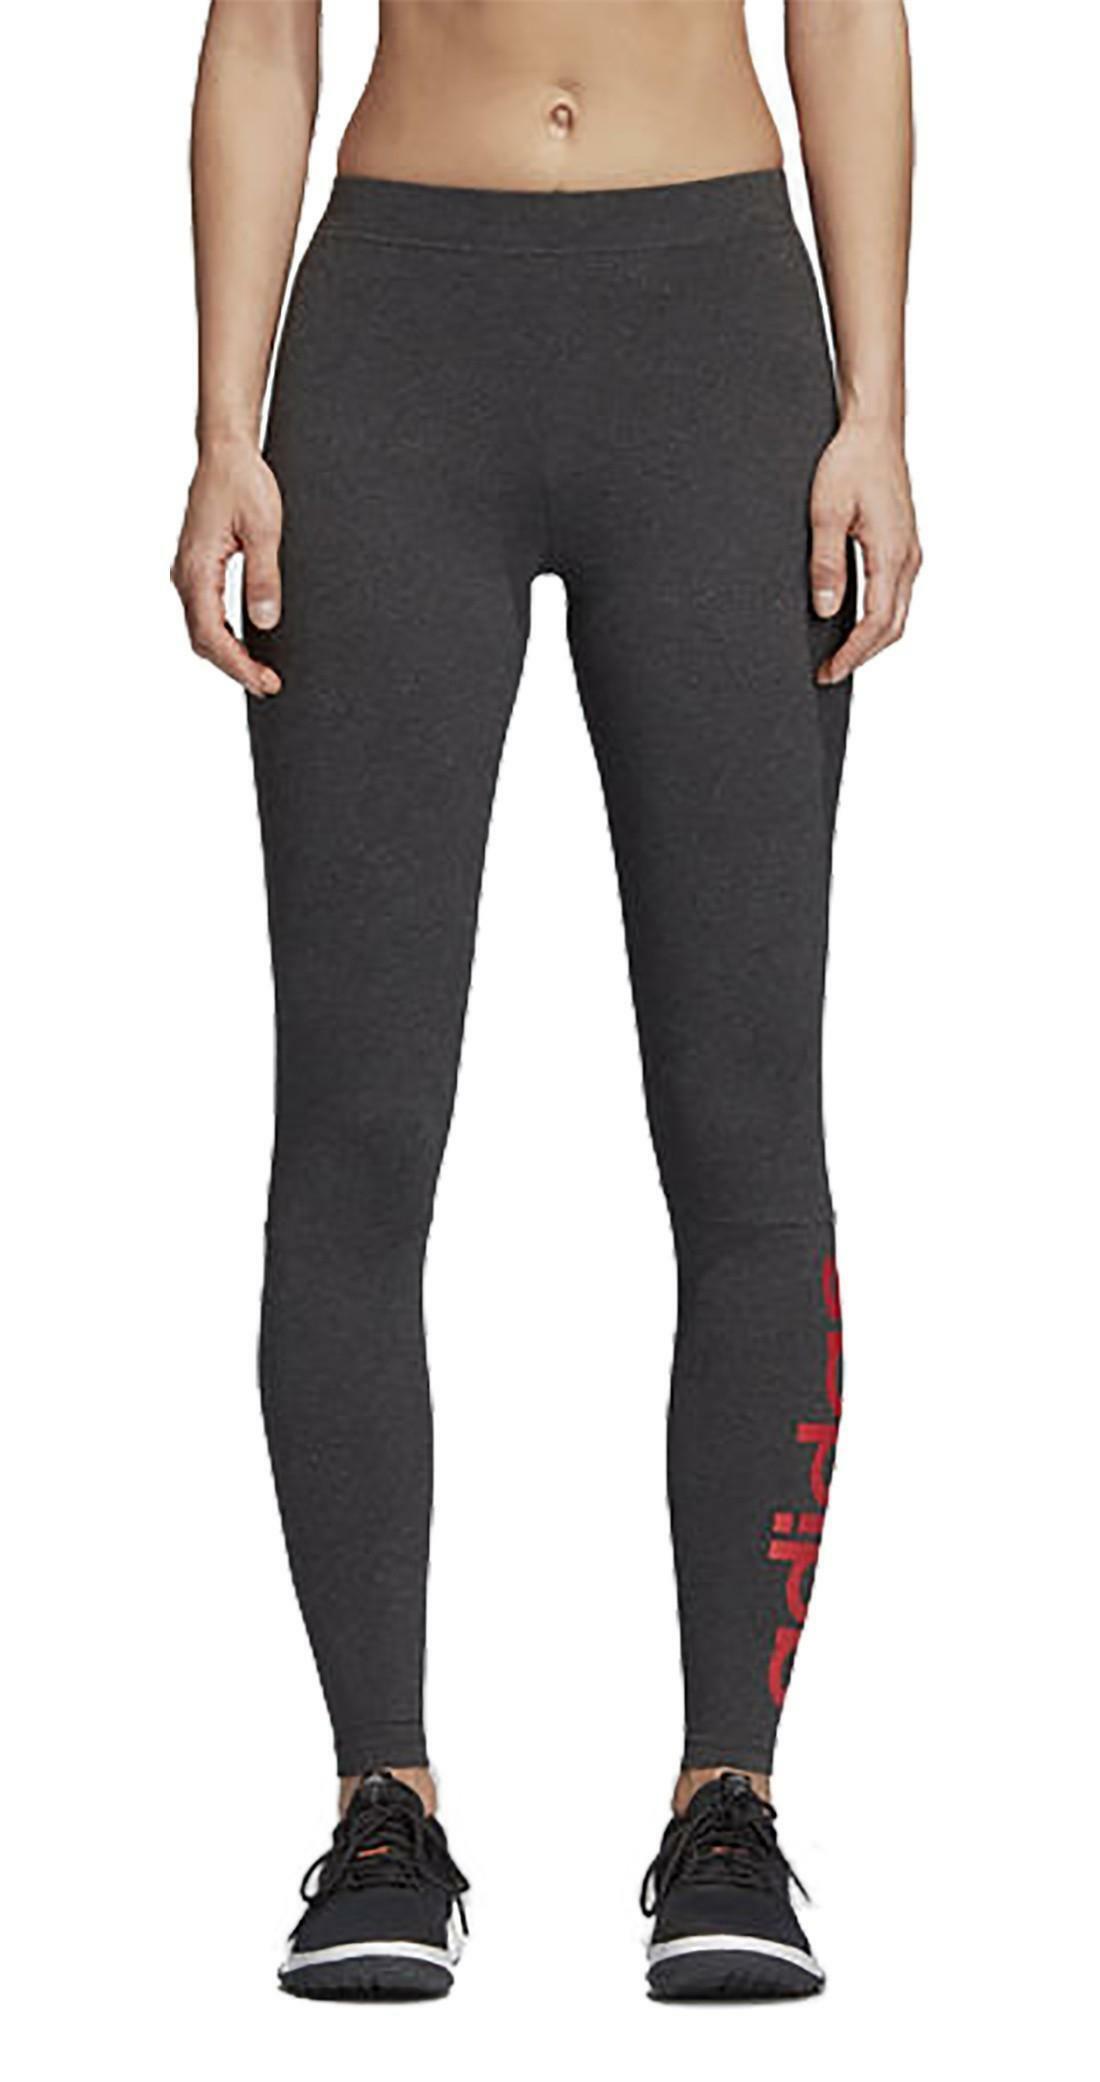 adidas adidas ess lin tight leggings donna grigi cz5740